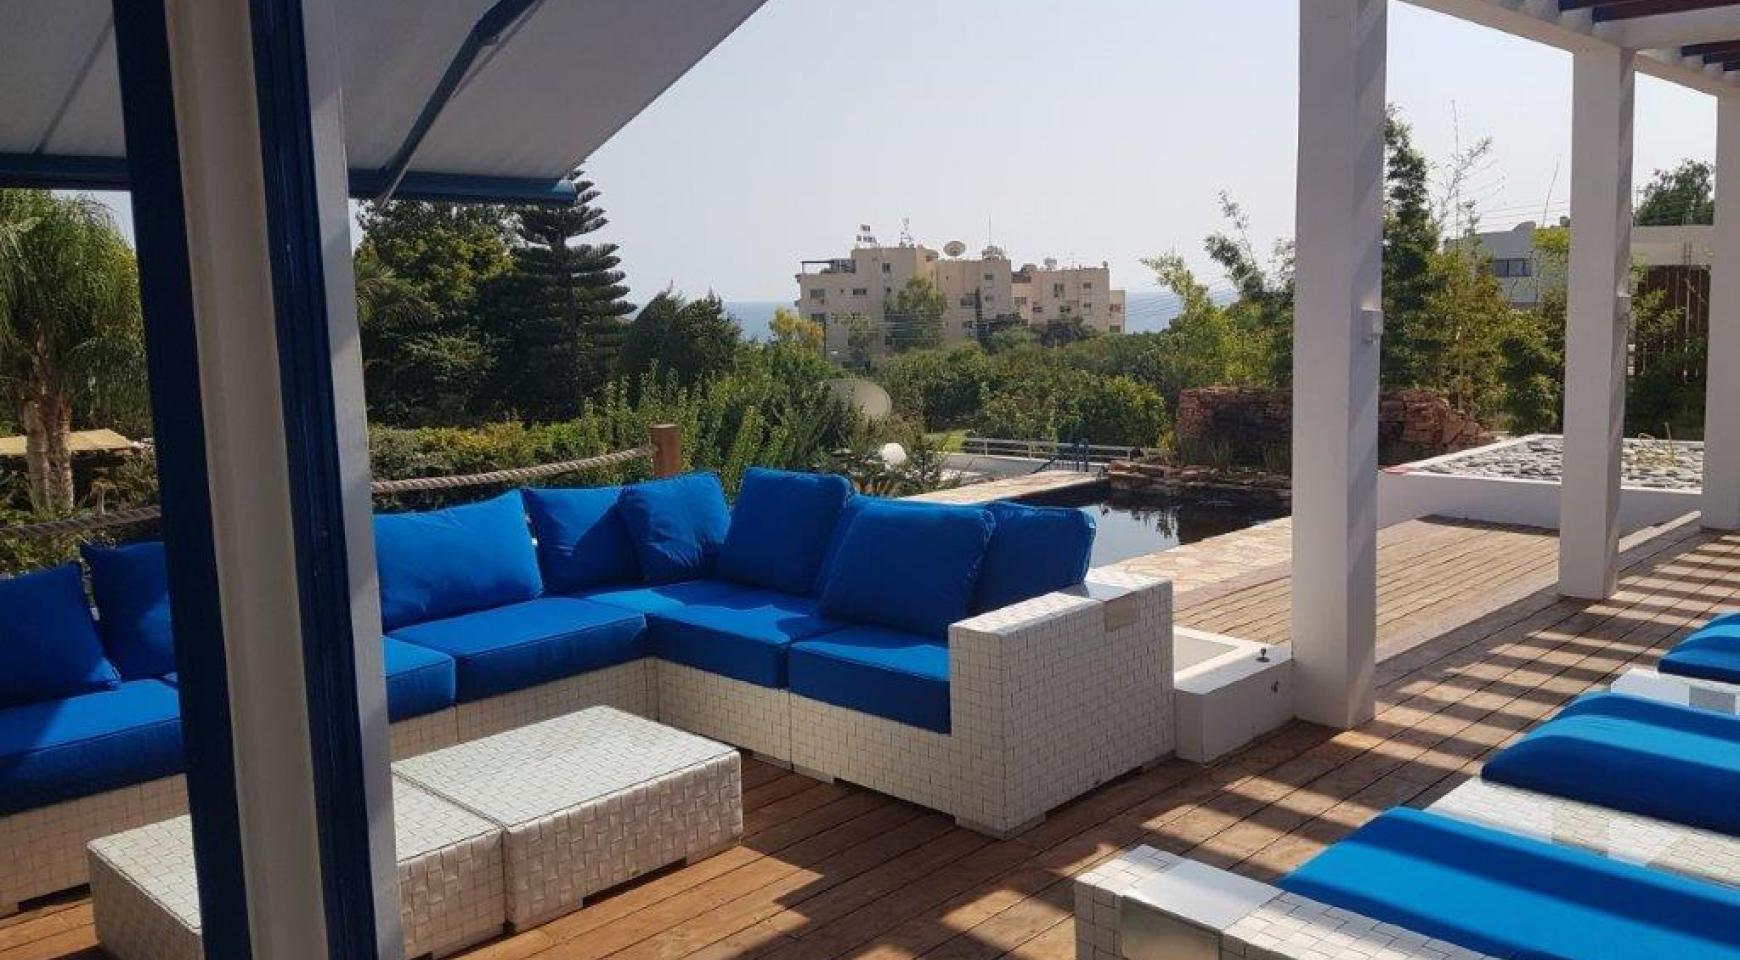 5-Спальная Вилла с видом на Море в районе  Agios Tychonas - 5